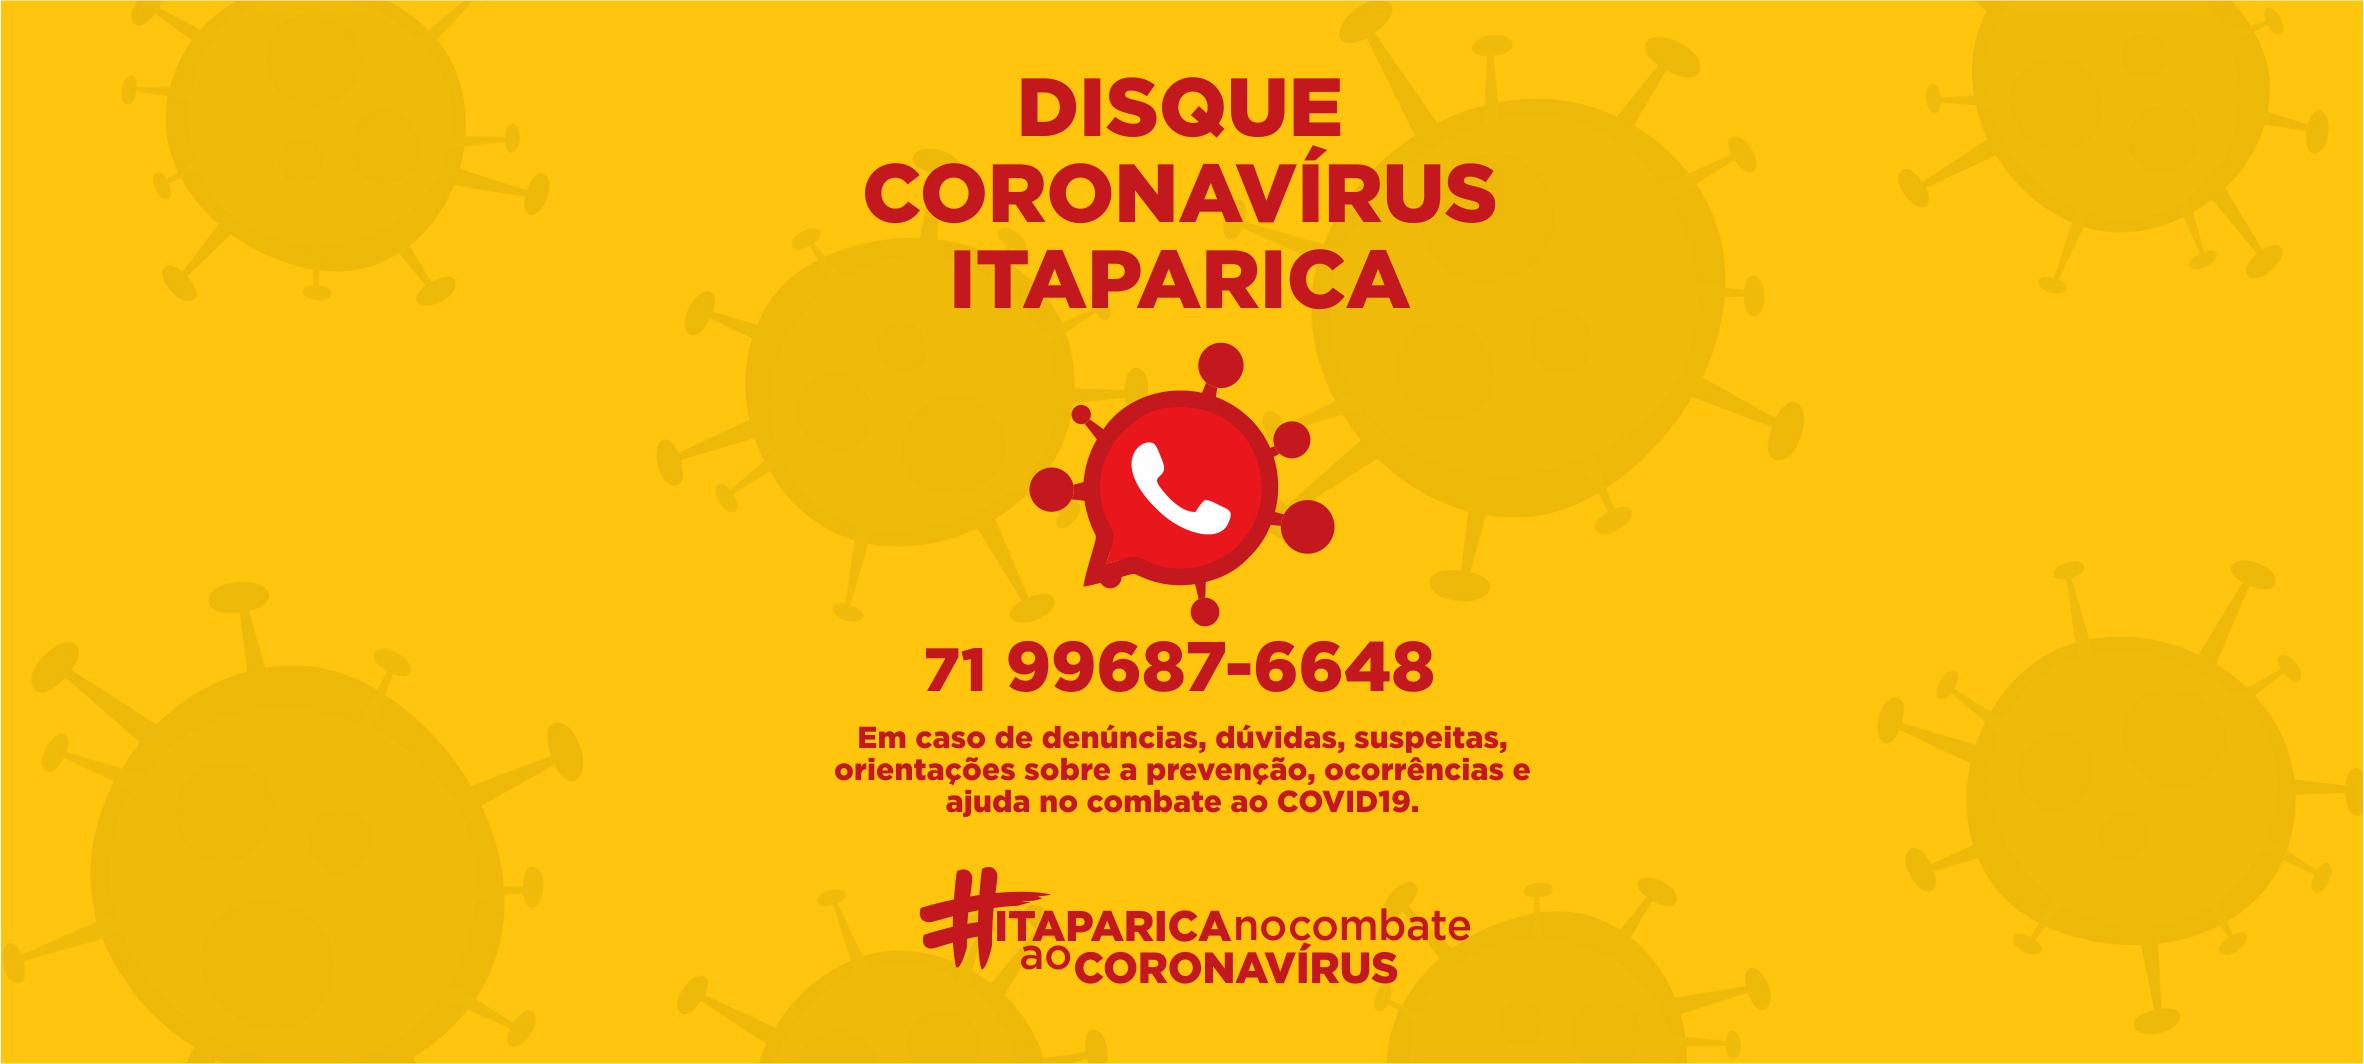 DISQUE_CORONAVÍRUS_ITAPARICA